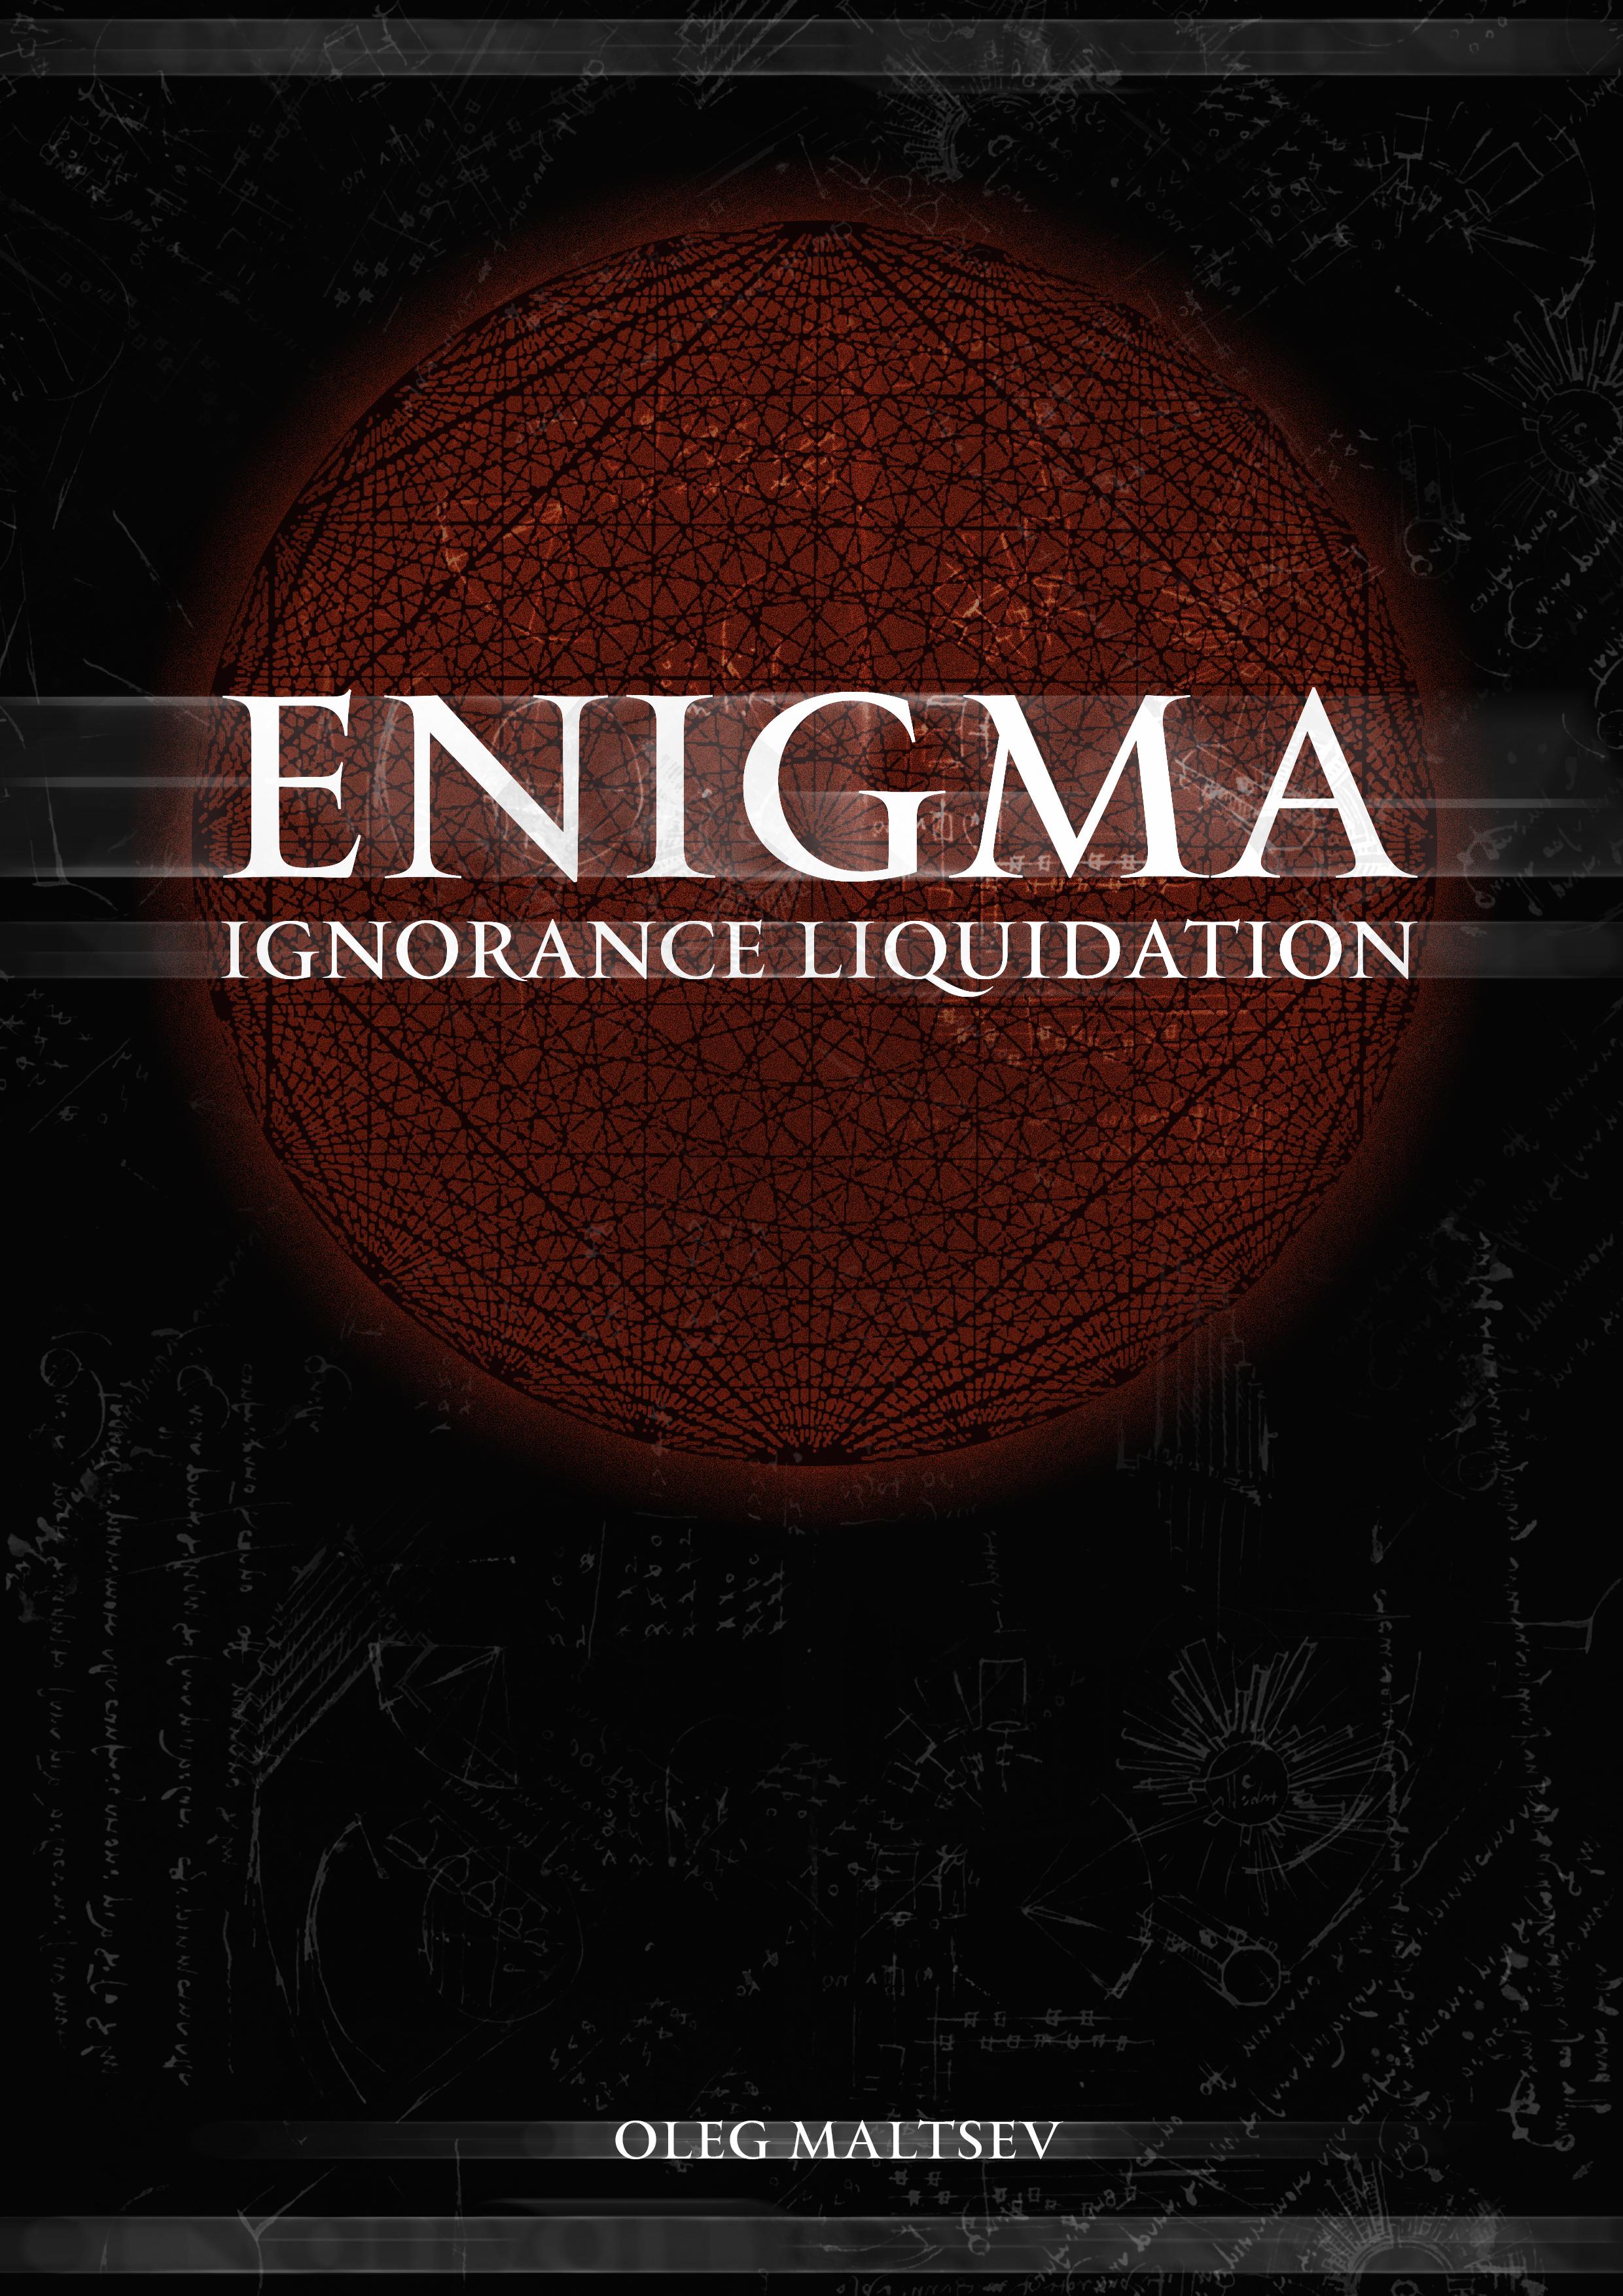 Enigma. Oleg Maltsev